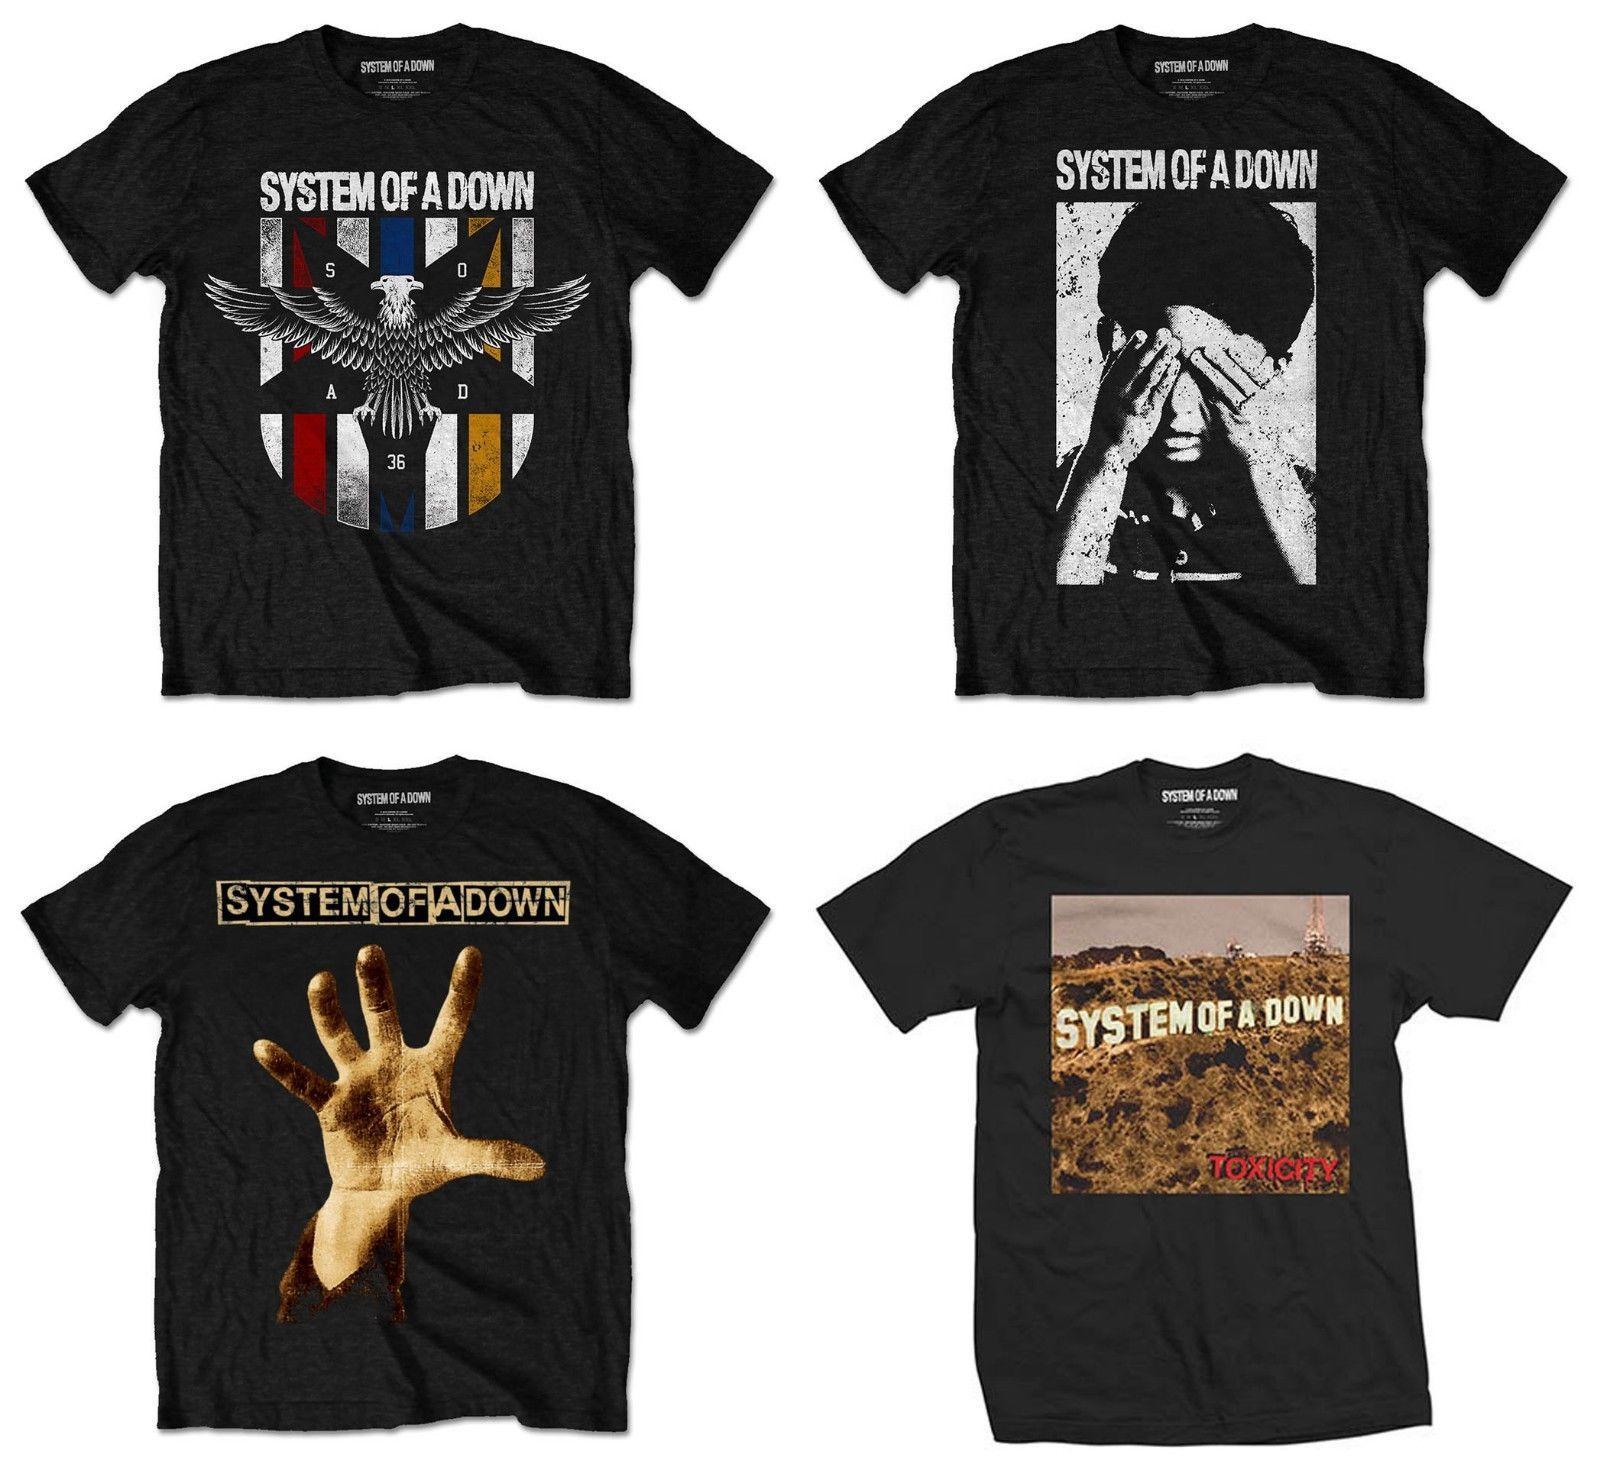 9b83e695be0d7 Compre Sistema De A Down Camiseta SOAD Toxicity Mezmerize Serj Tankian Korn  Top Oficial De Shirtifdesign